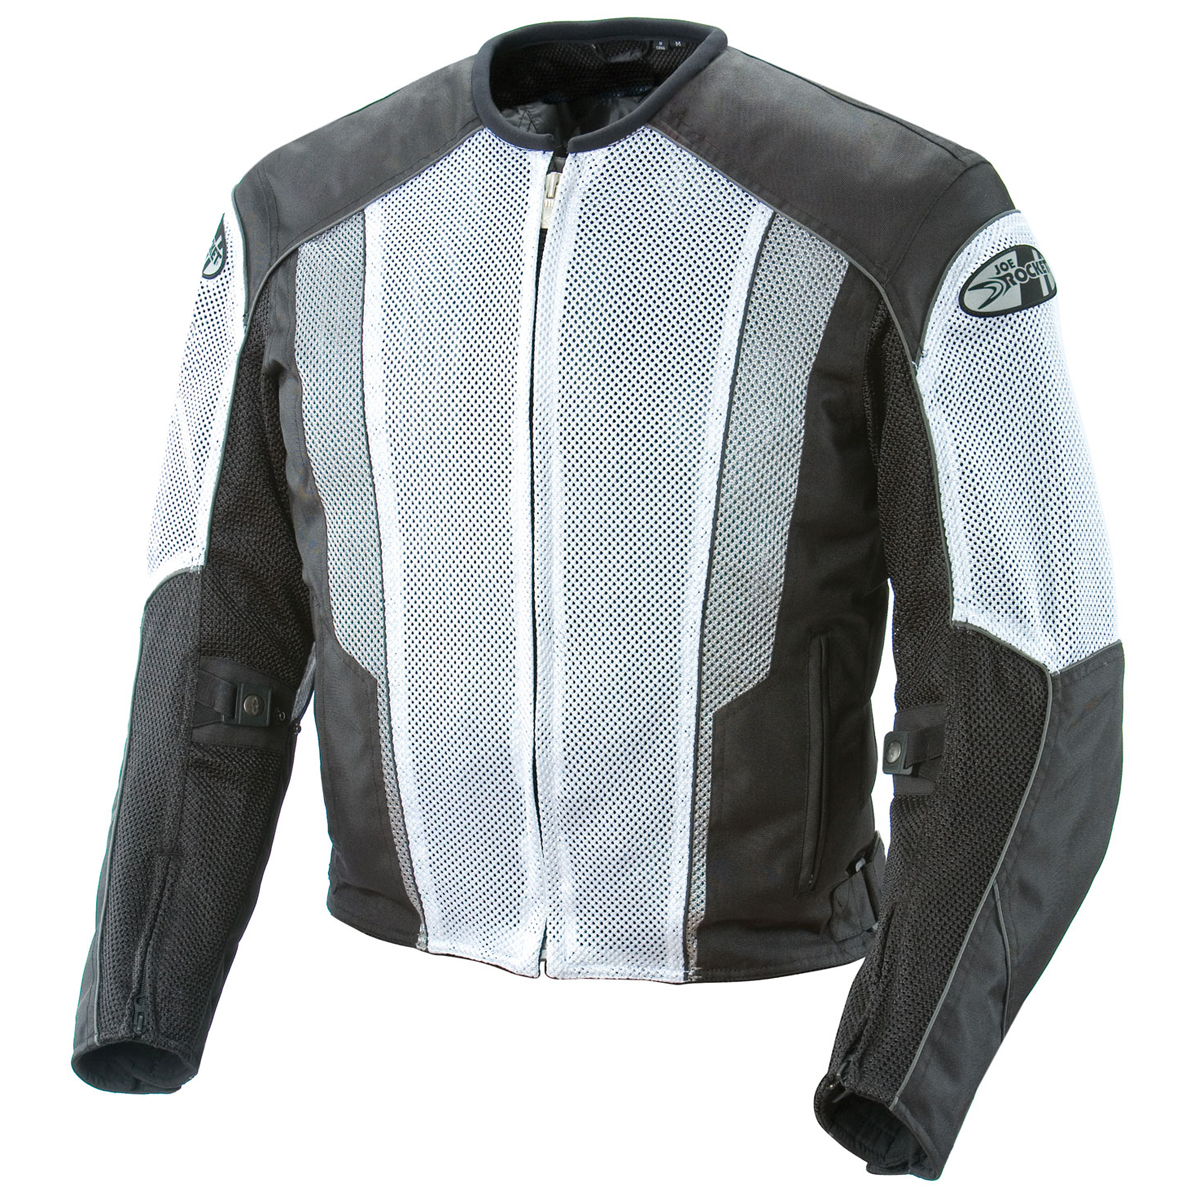 Joe Rocket Phoenix 5.0 Mens White/Black Mesh Motorcycle J...